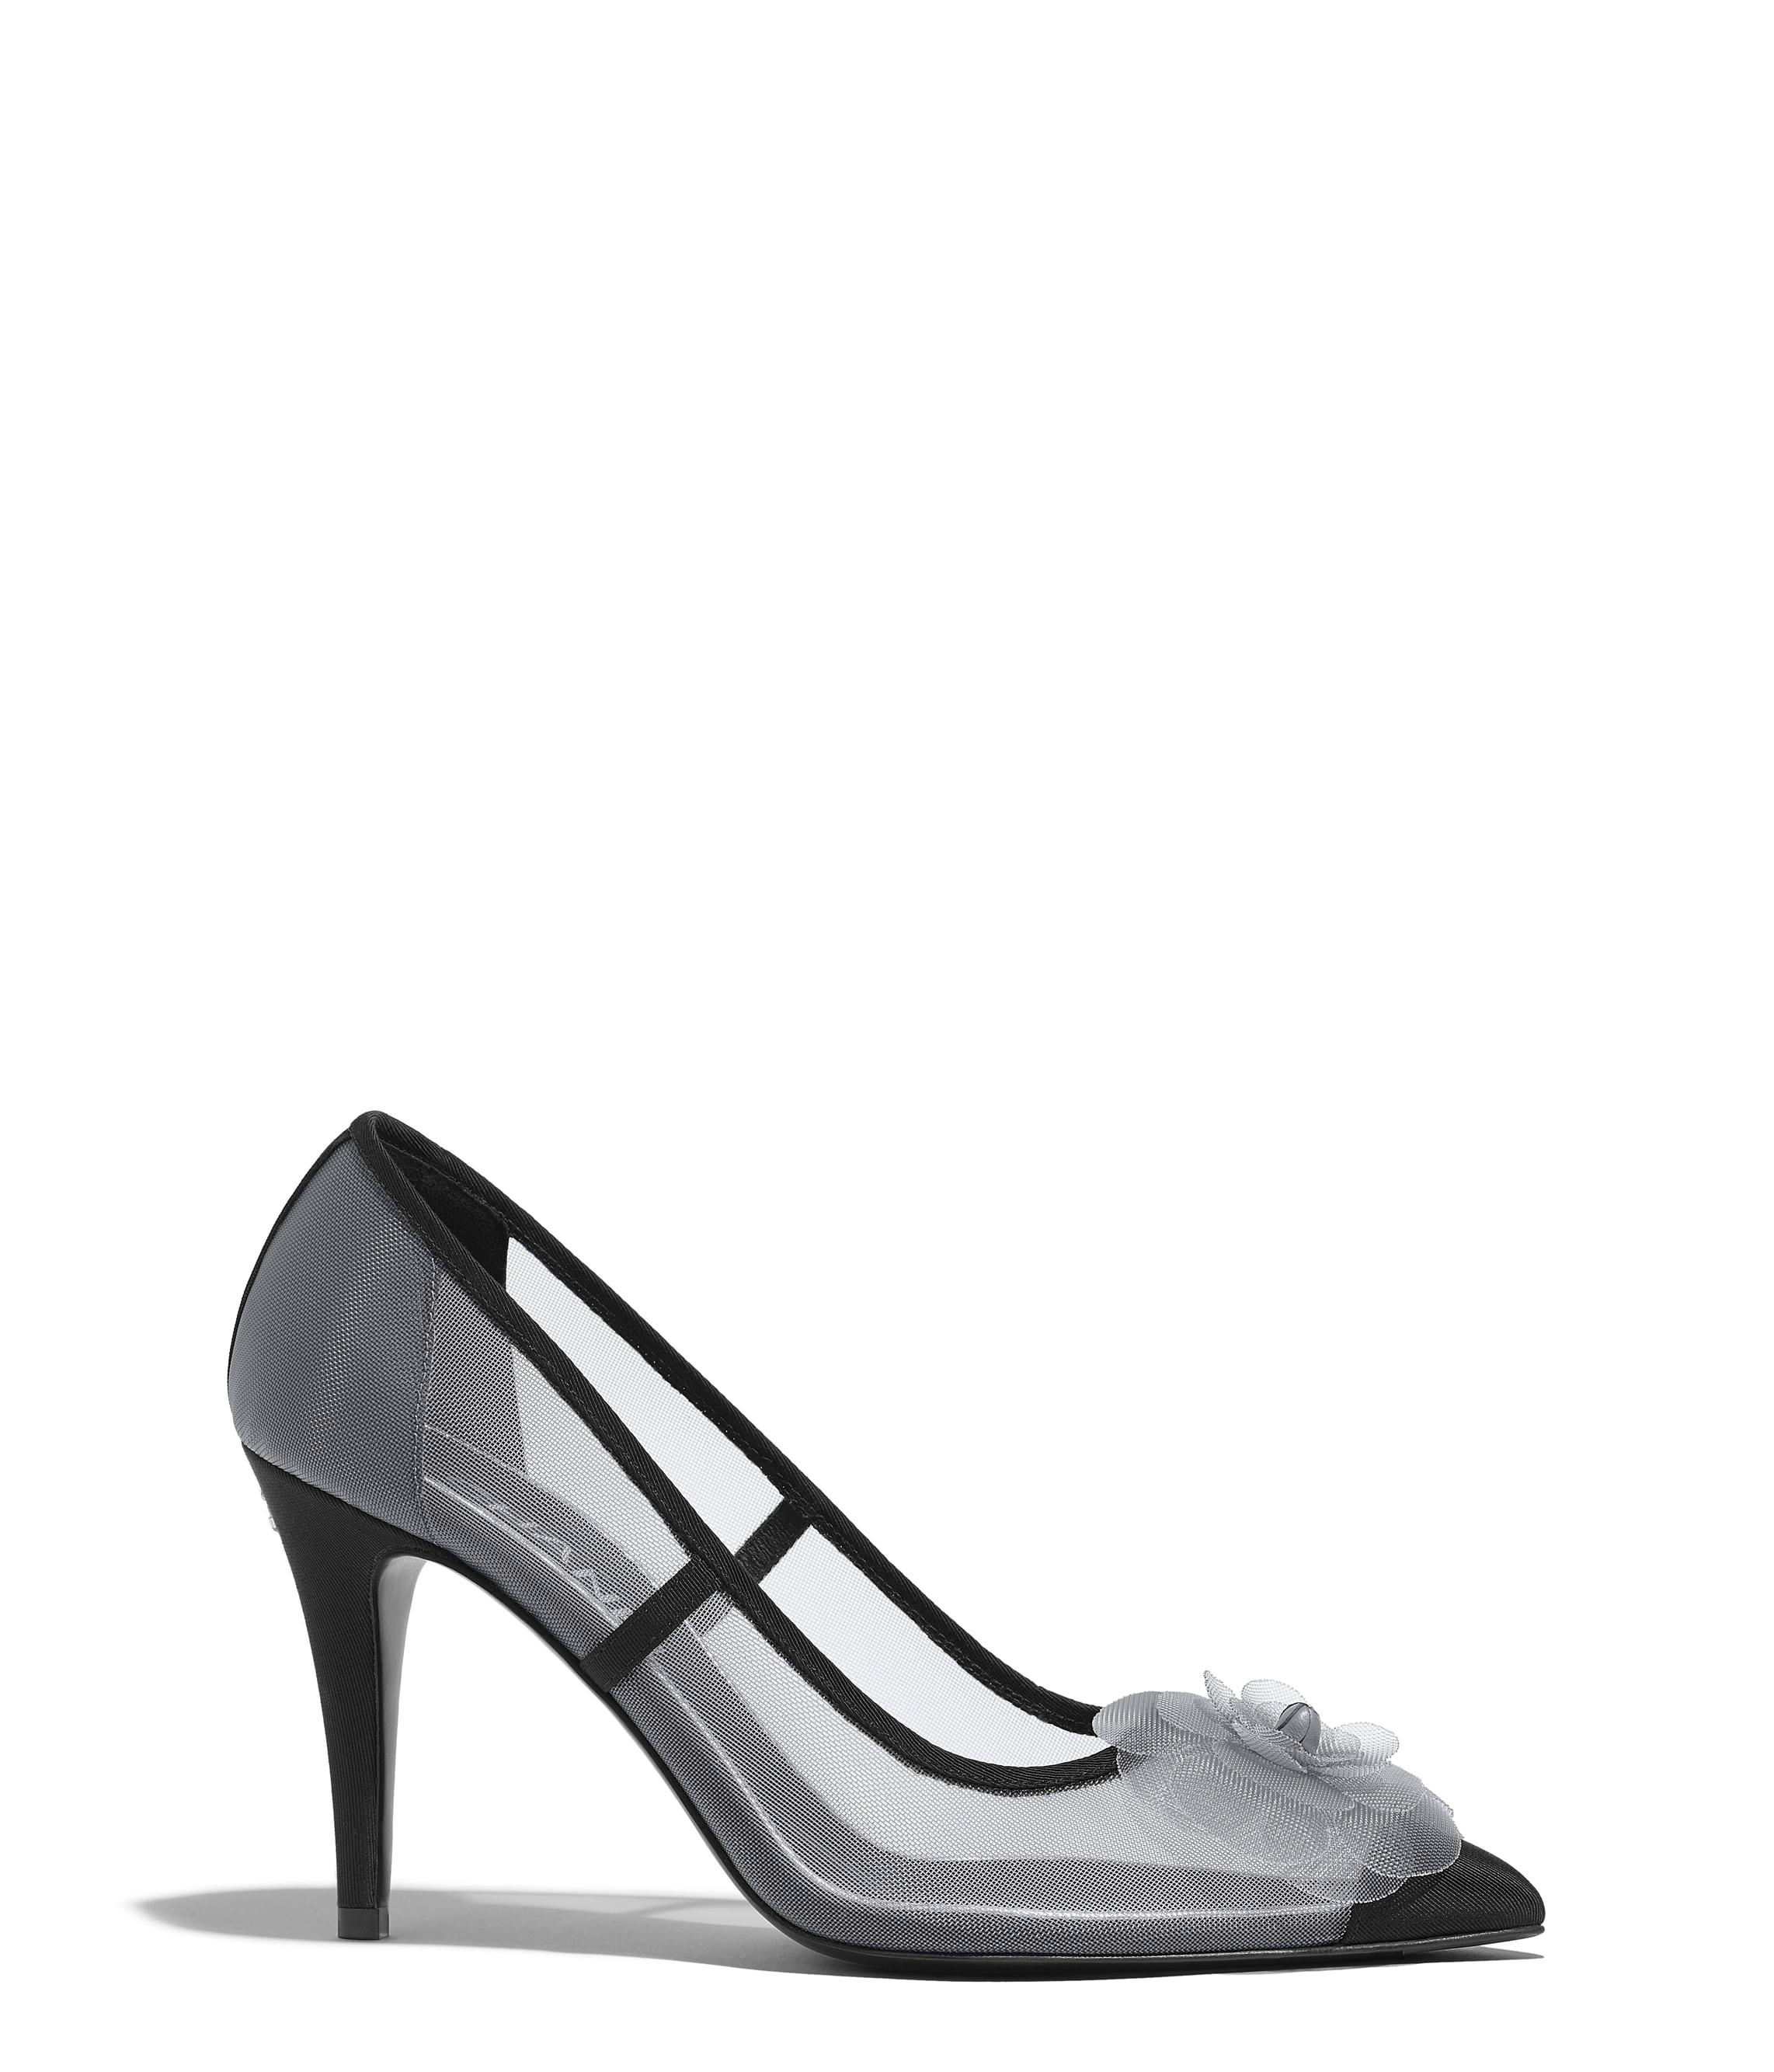 0493cf507b27 Pumps   Slingbacks - Shoes - CHANEL